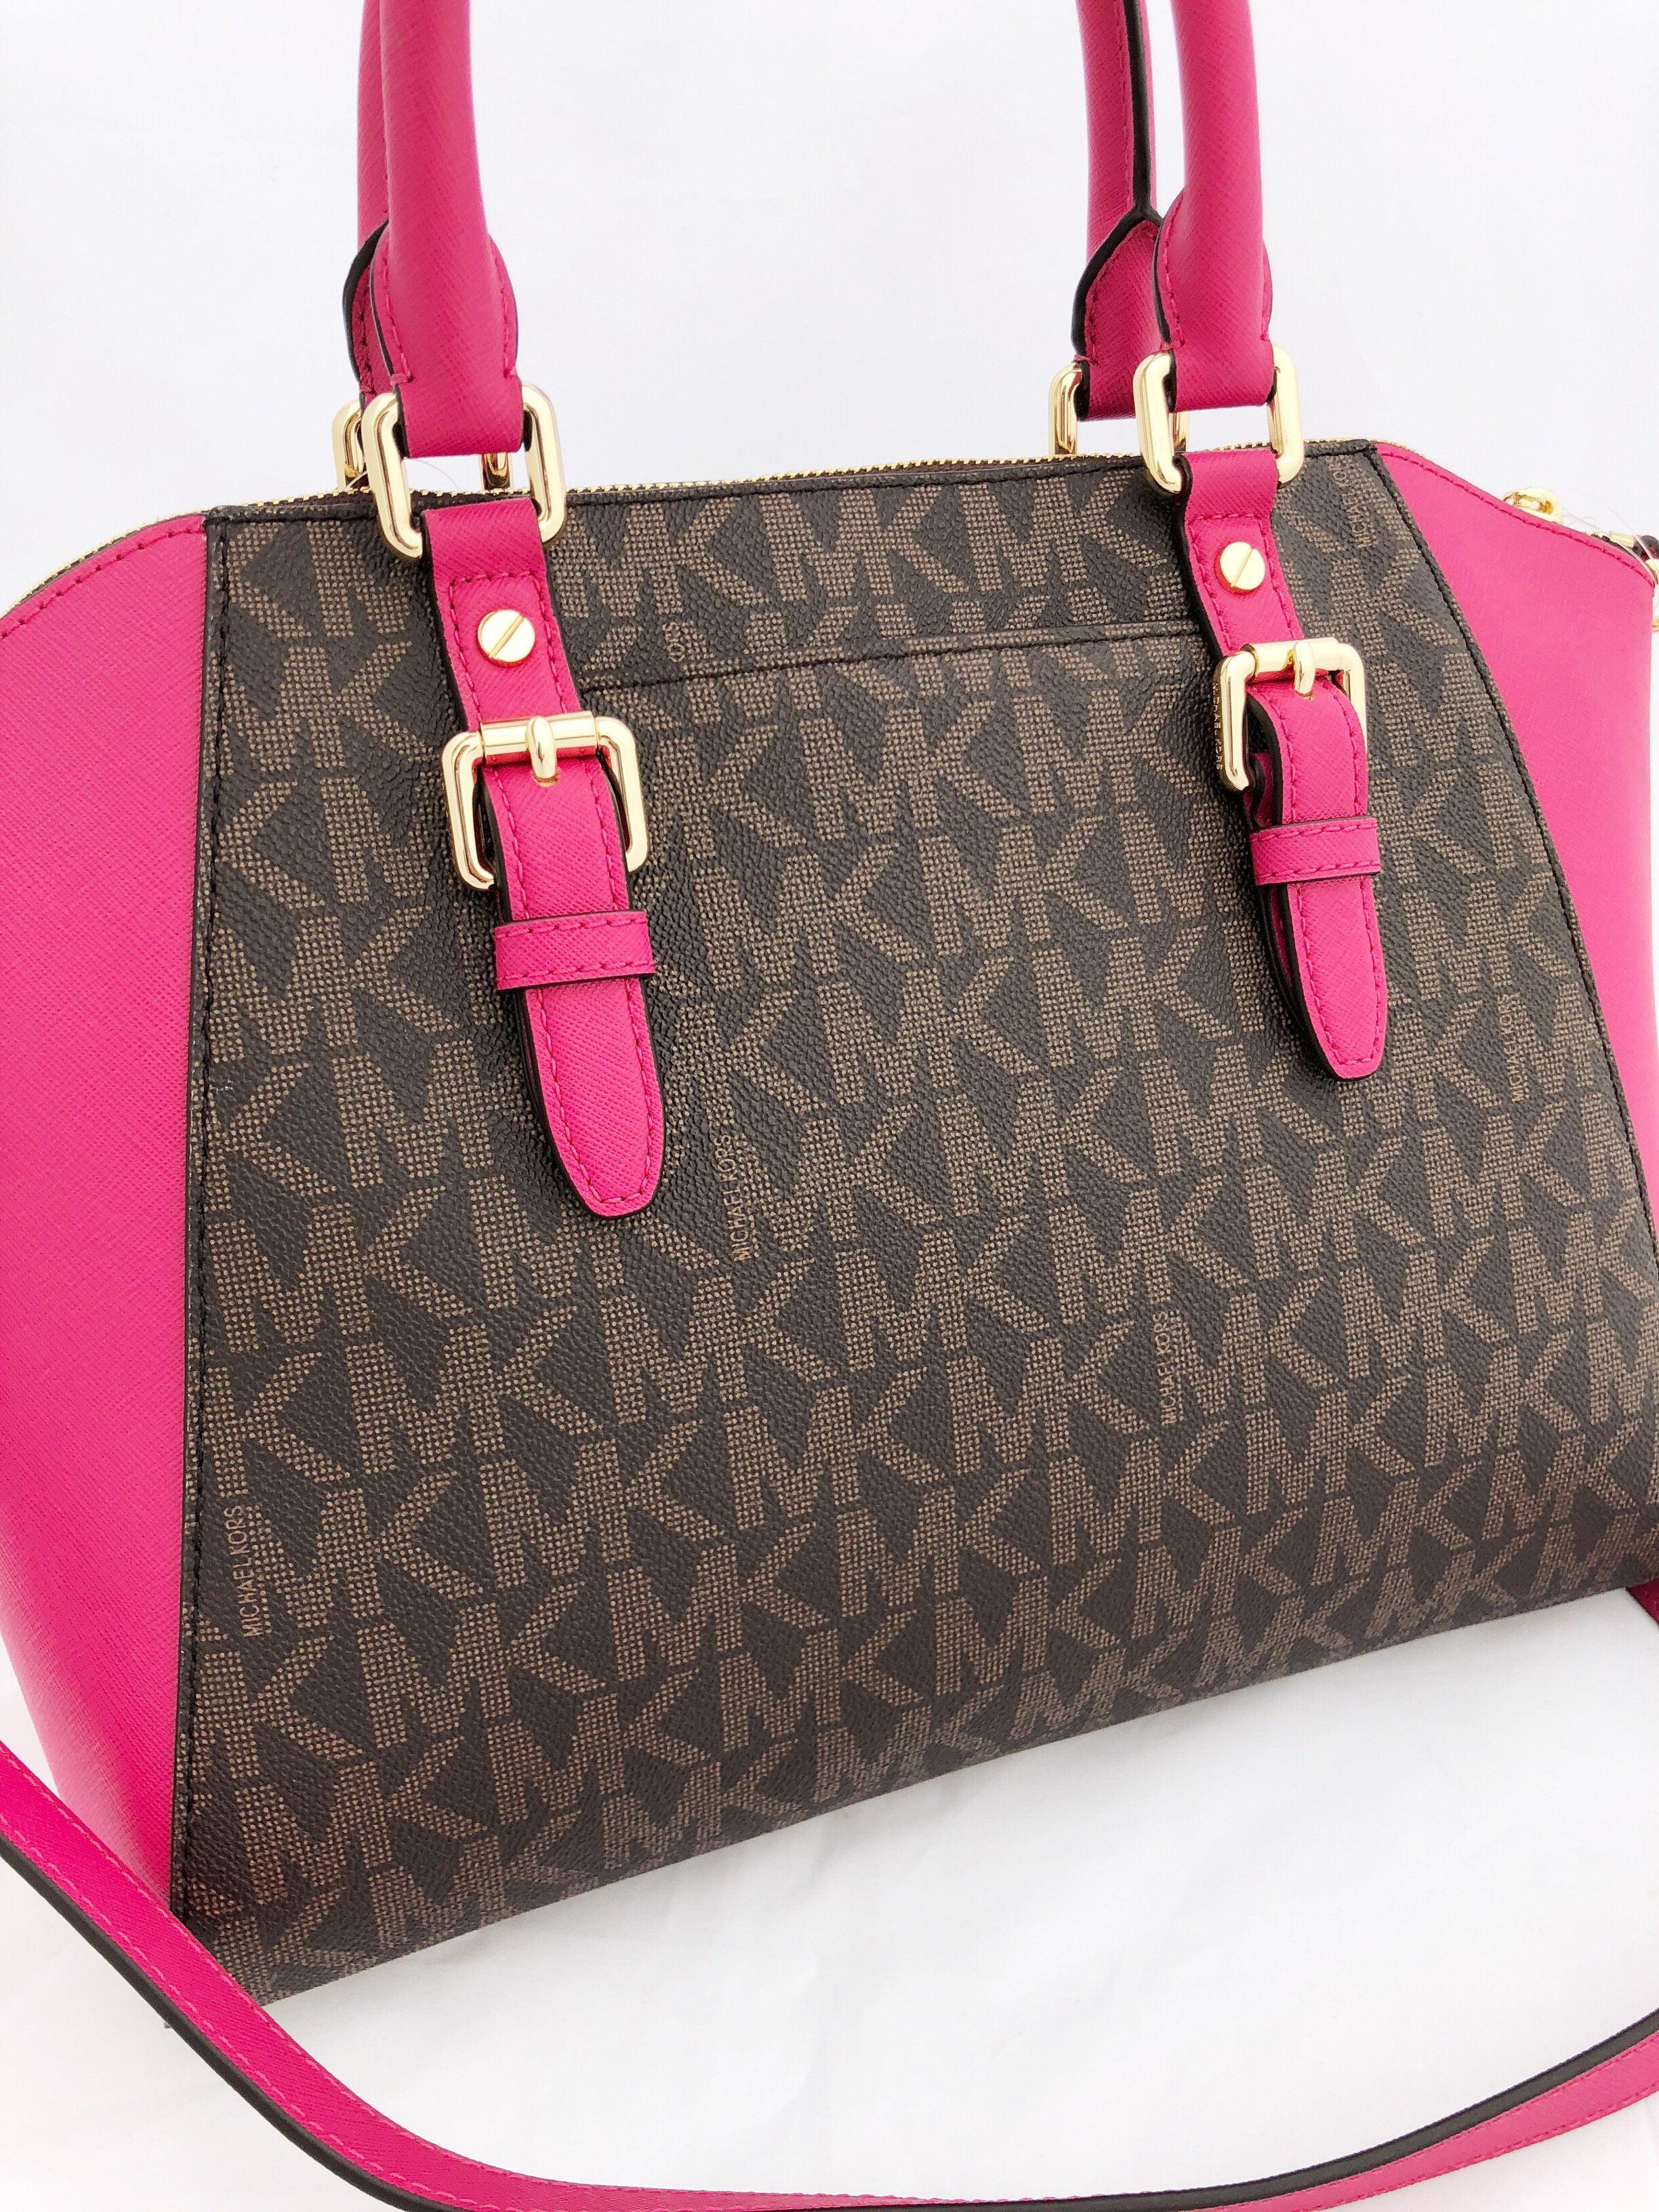 86dc08dbd06eb3 Michael Kors - Michael Kors Ciara Large Zip Satchel Crossbody Brown MK  Ultra Pink - Walmart.com